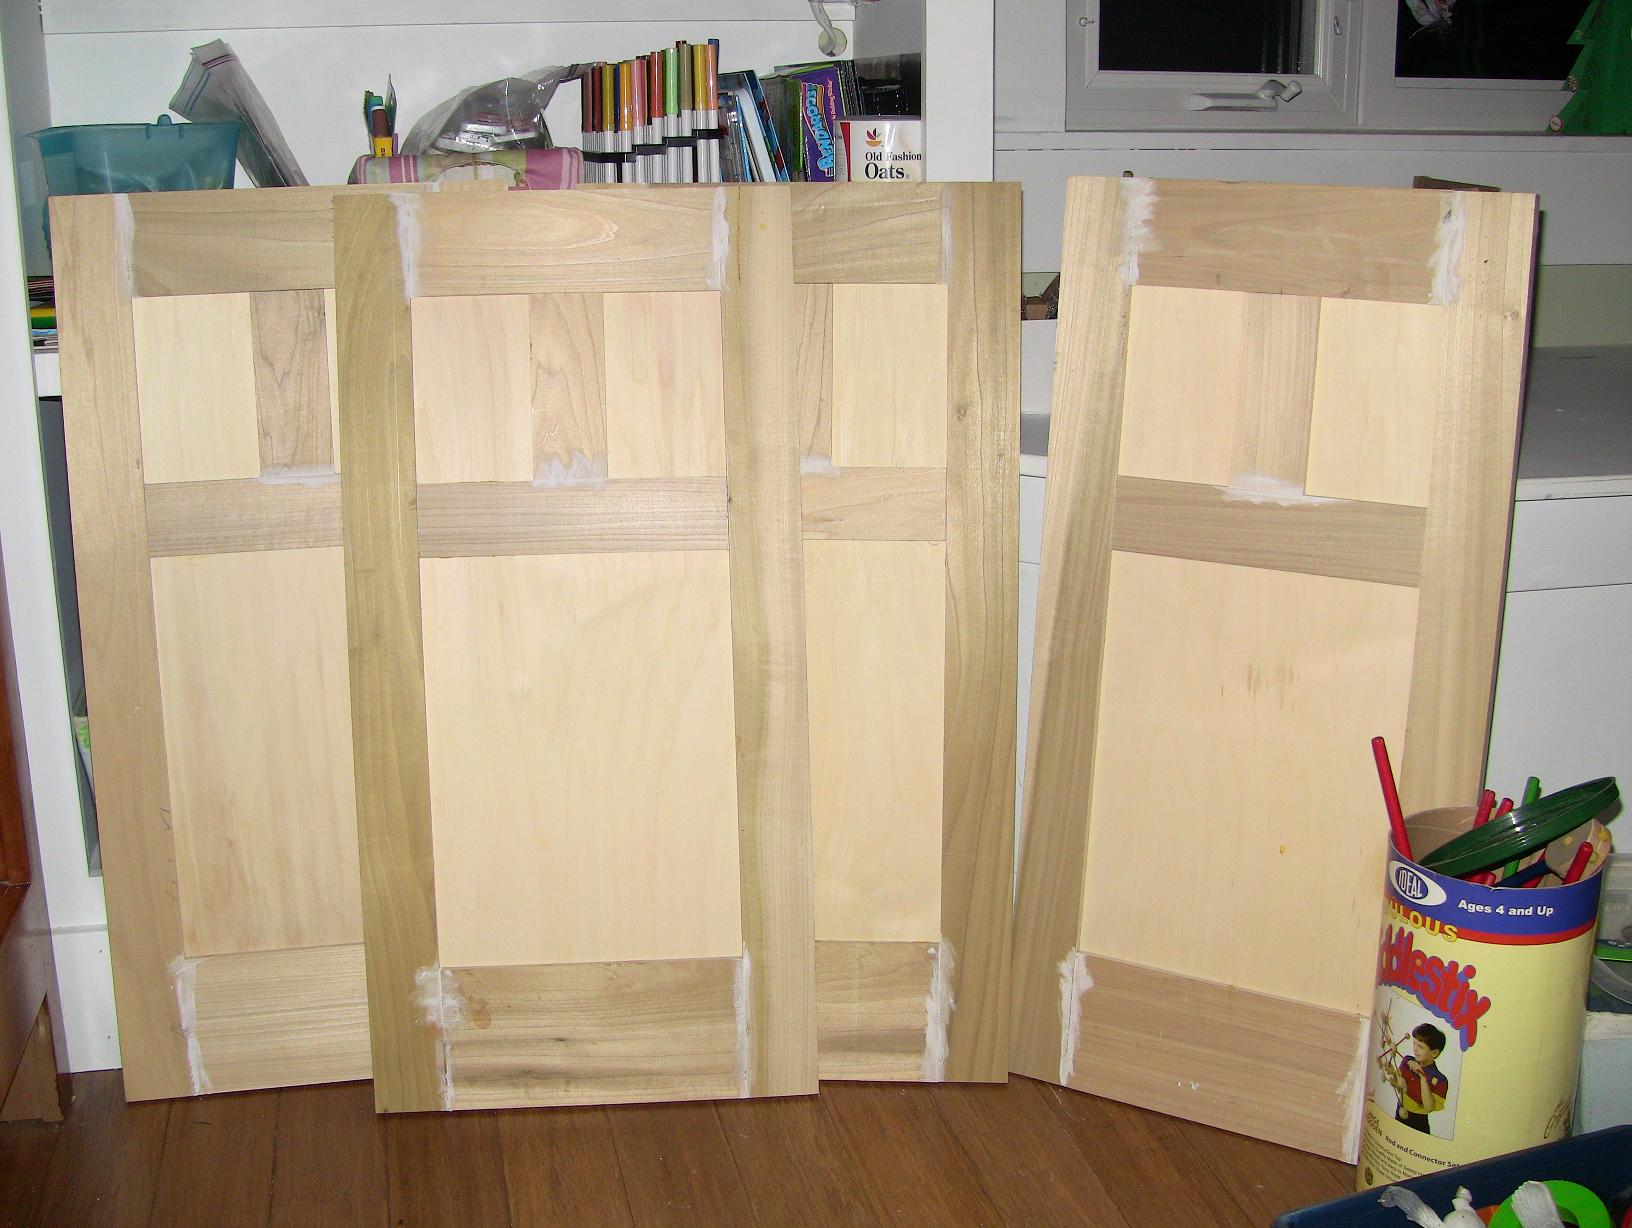 Updating plywood cabinet doors